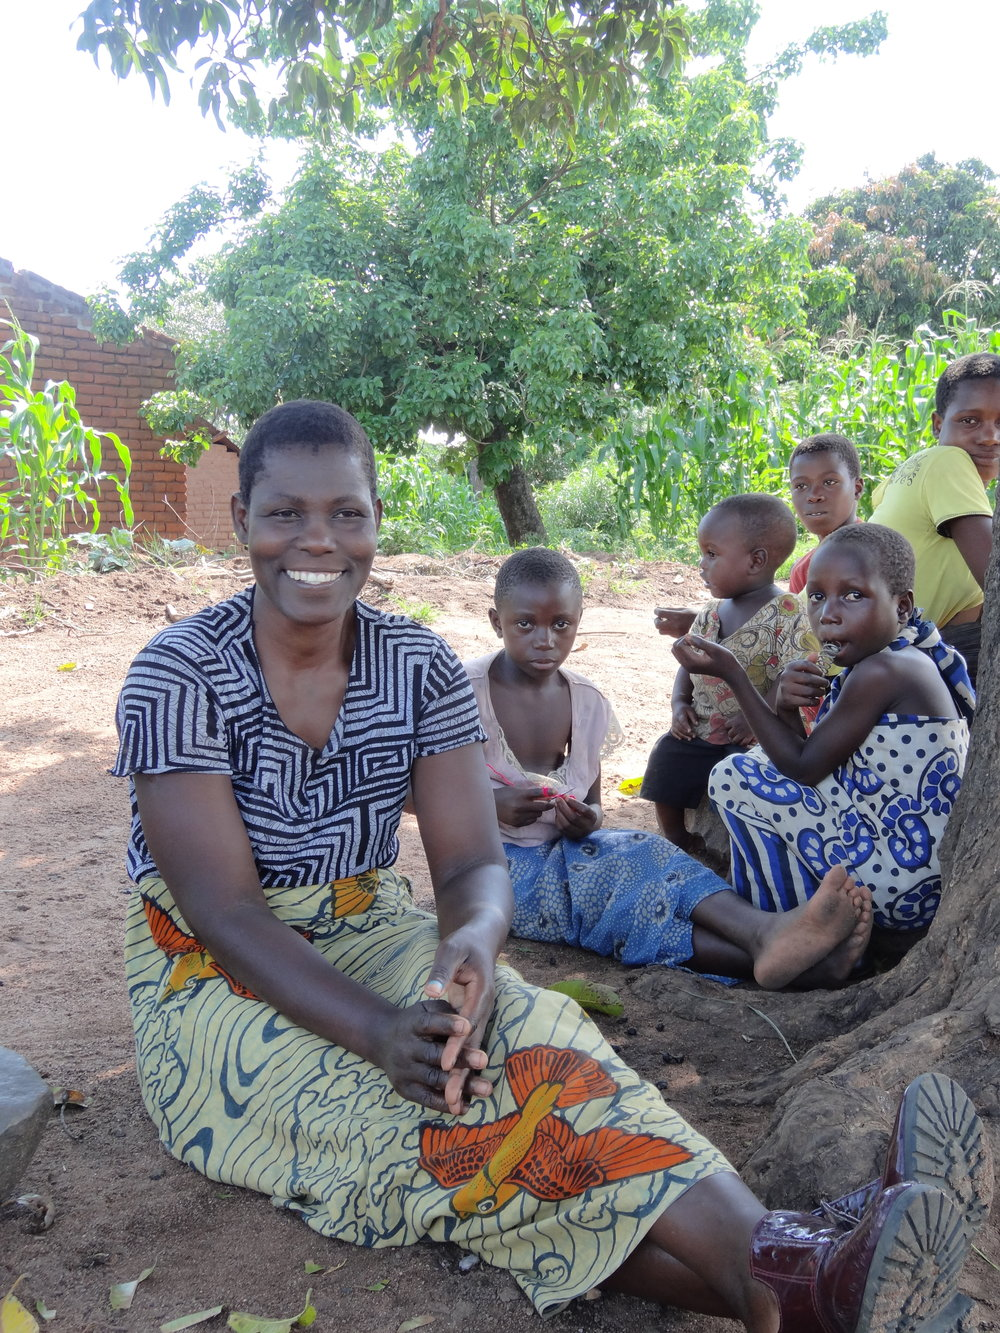 Gladys Nkwanda, single mother of Seven